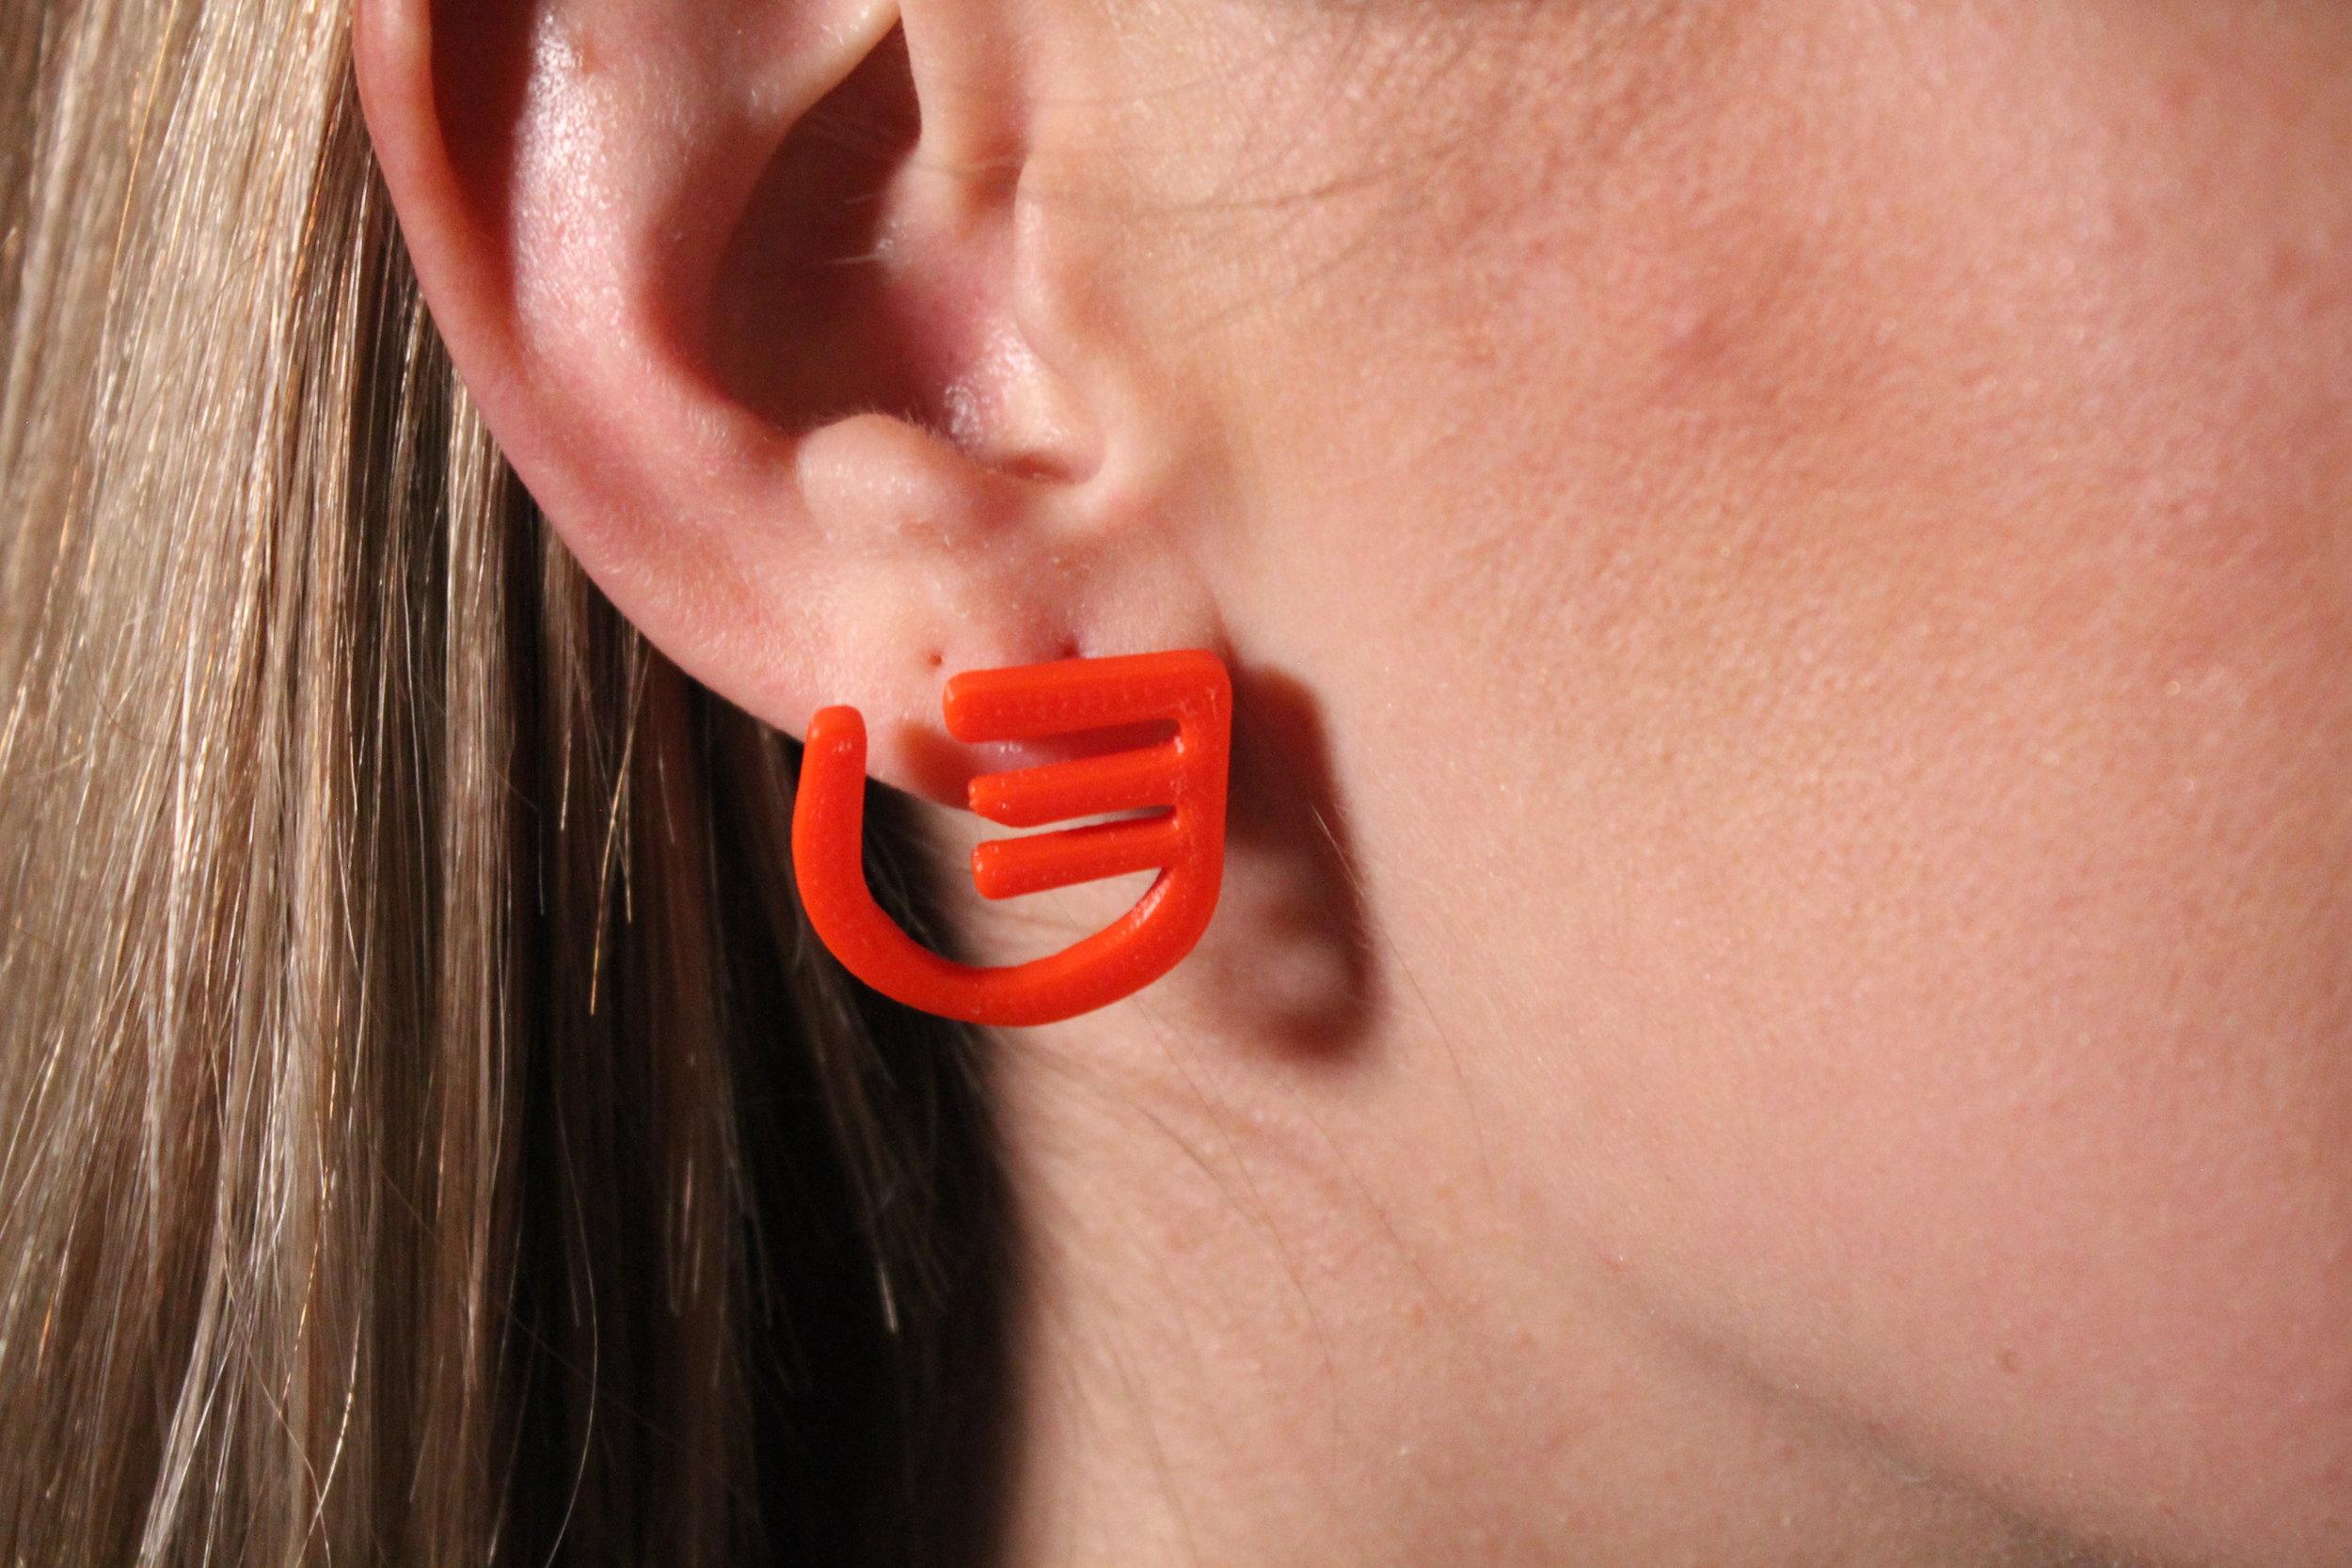 tribal-earrings_34987744191_o.jpg